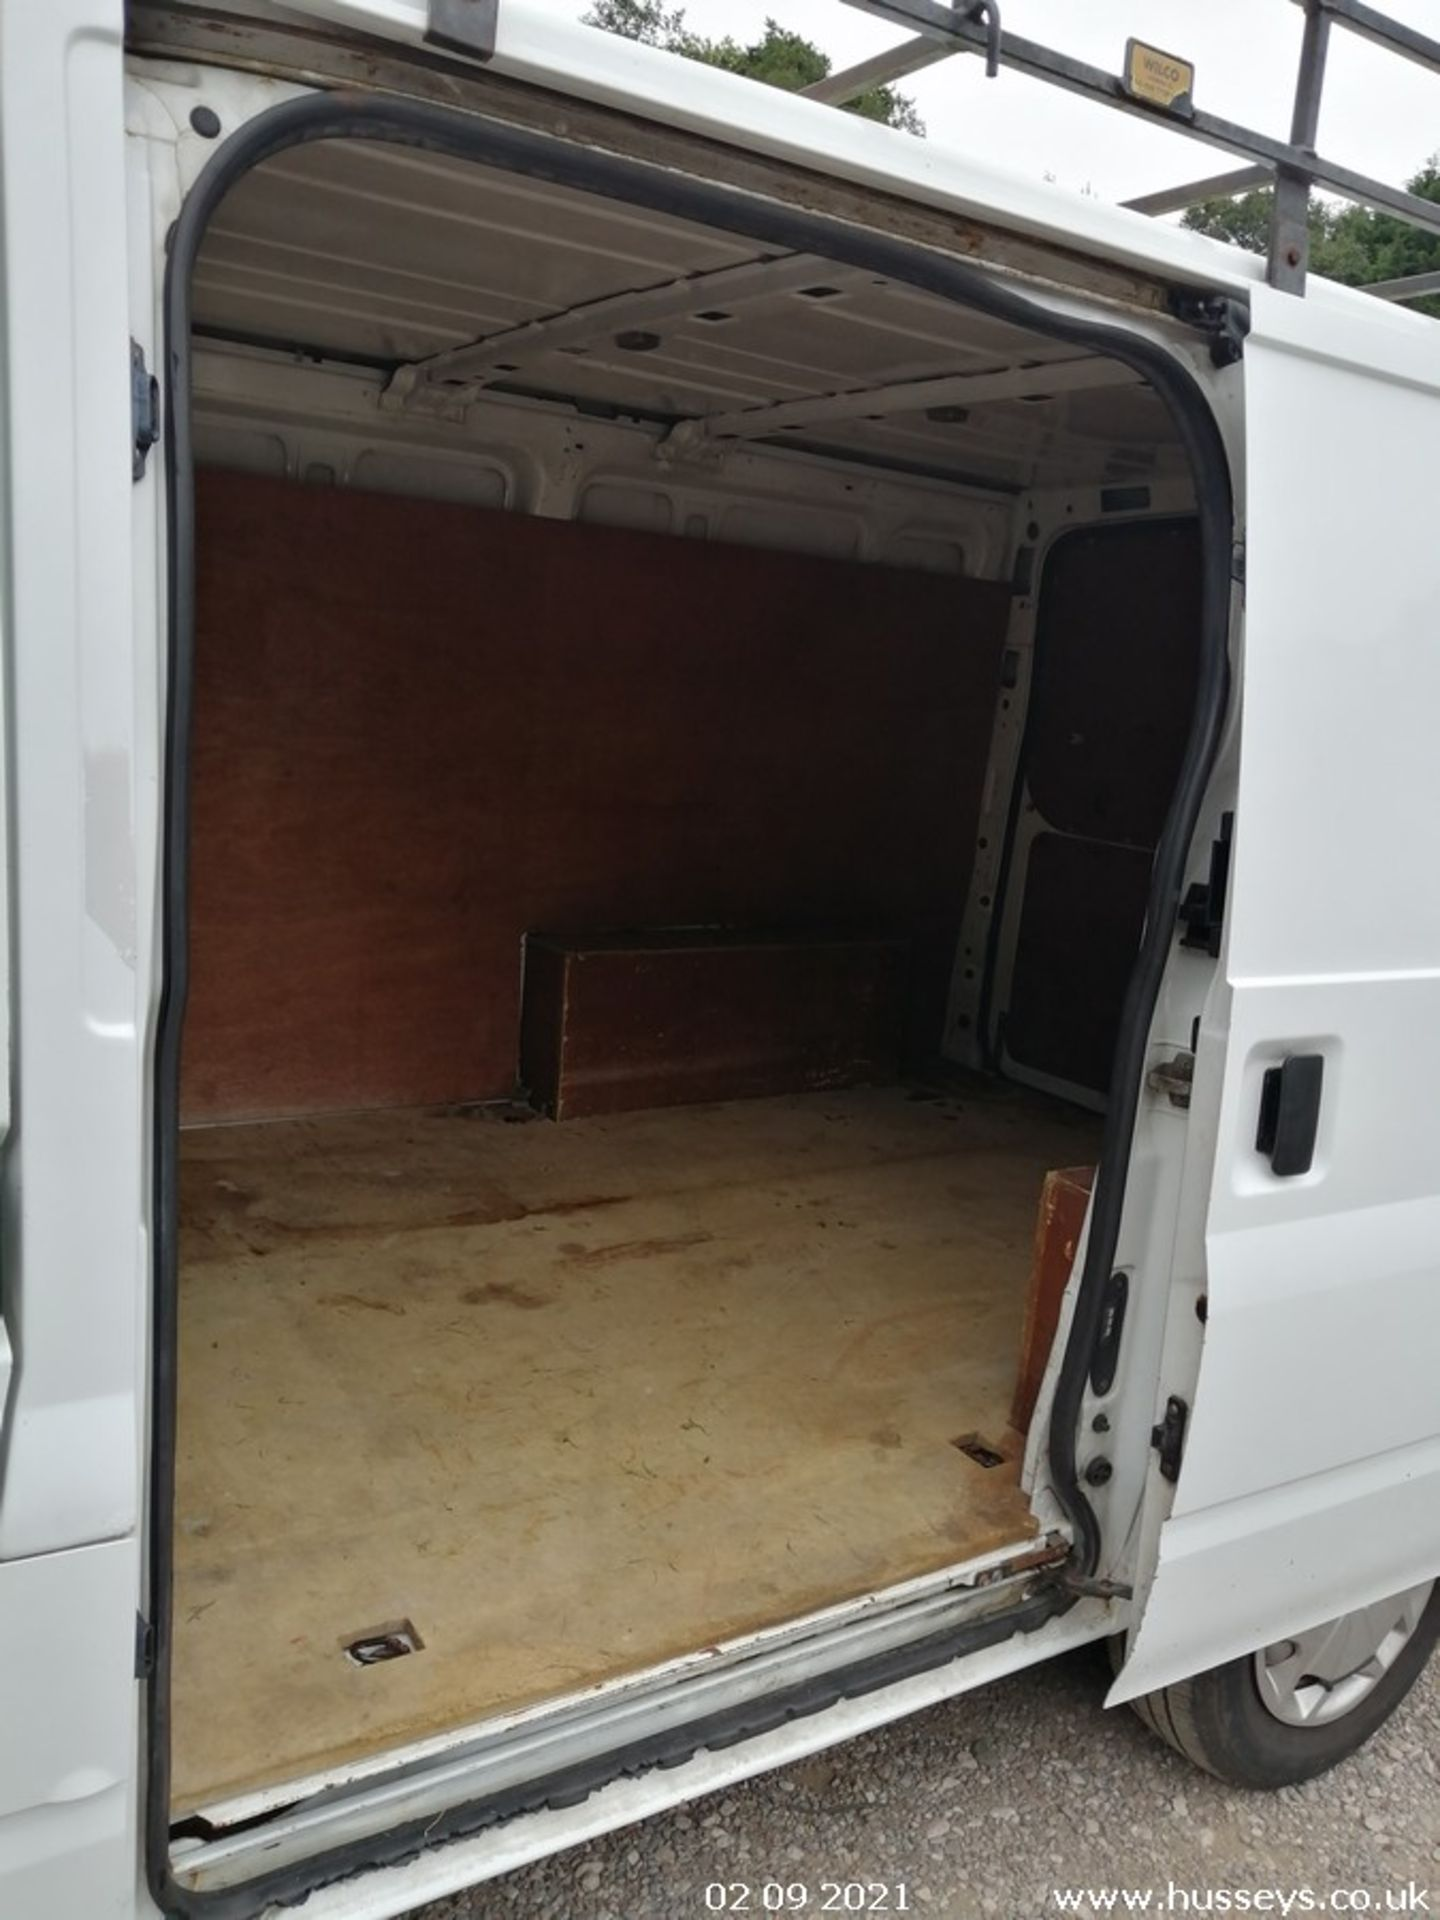 10/60 FORD TRANSIT 85 T260M FWD - 2198cc 5dr Van (White, 237k) - Image 17 of 23